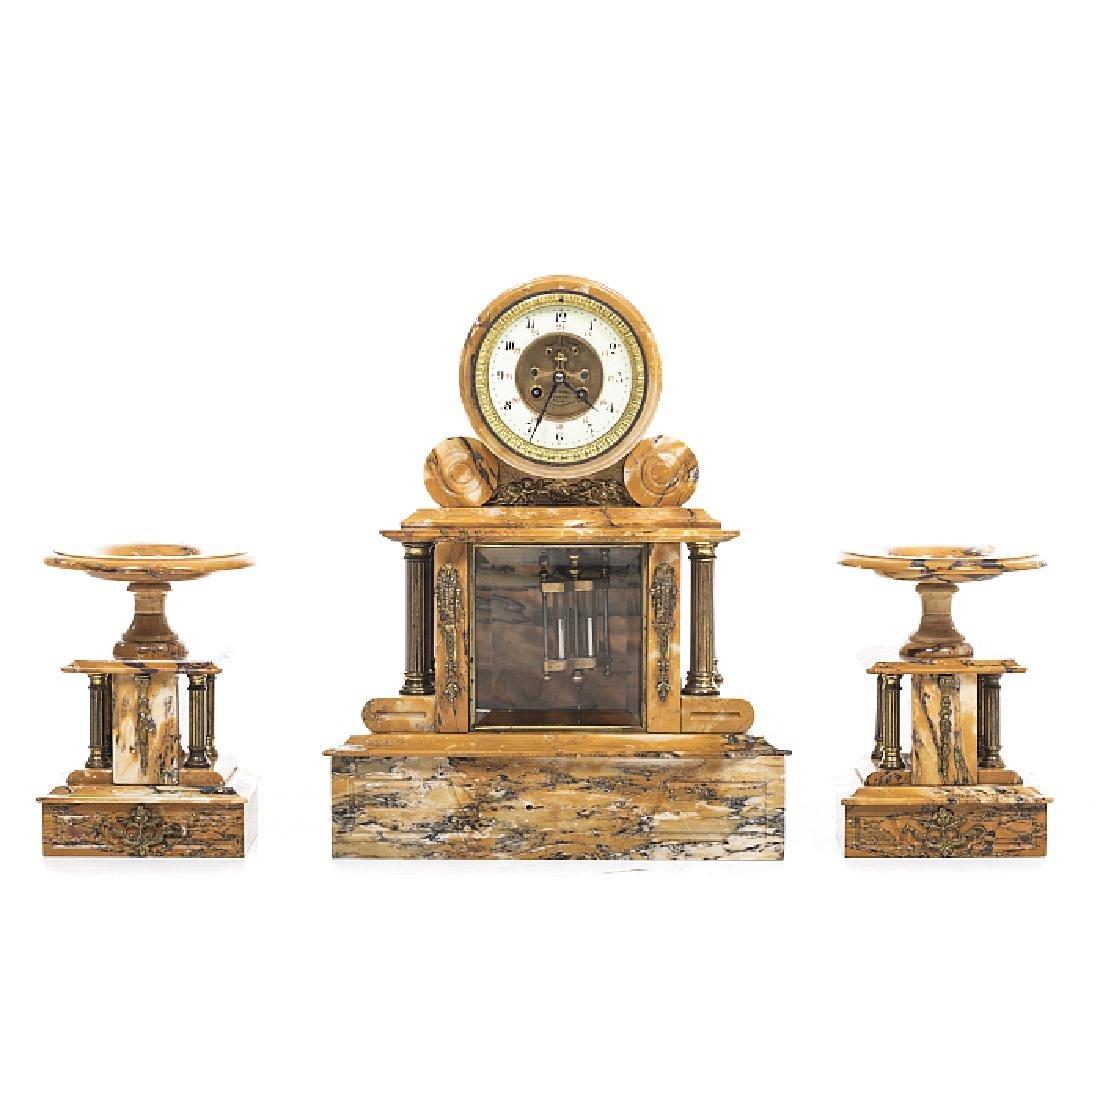 Table clock garniture, pair of cassolettes